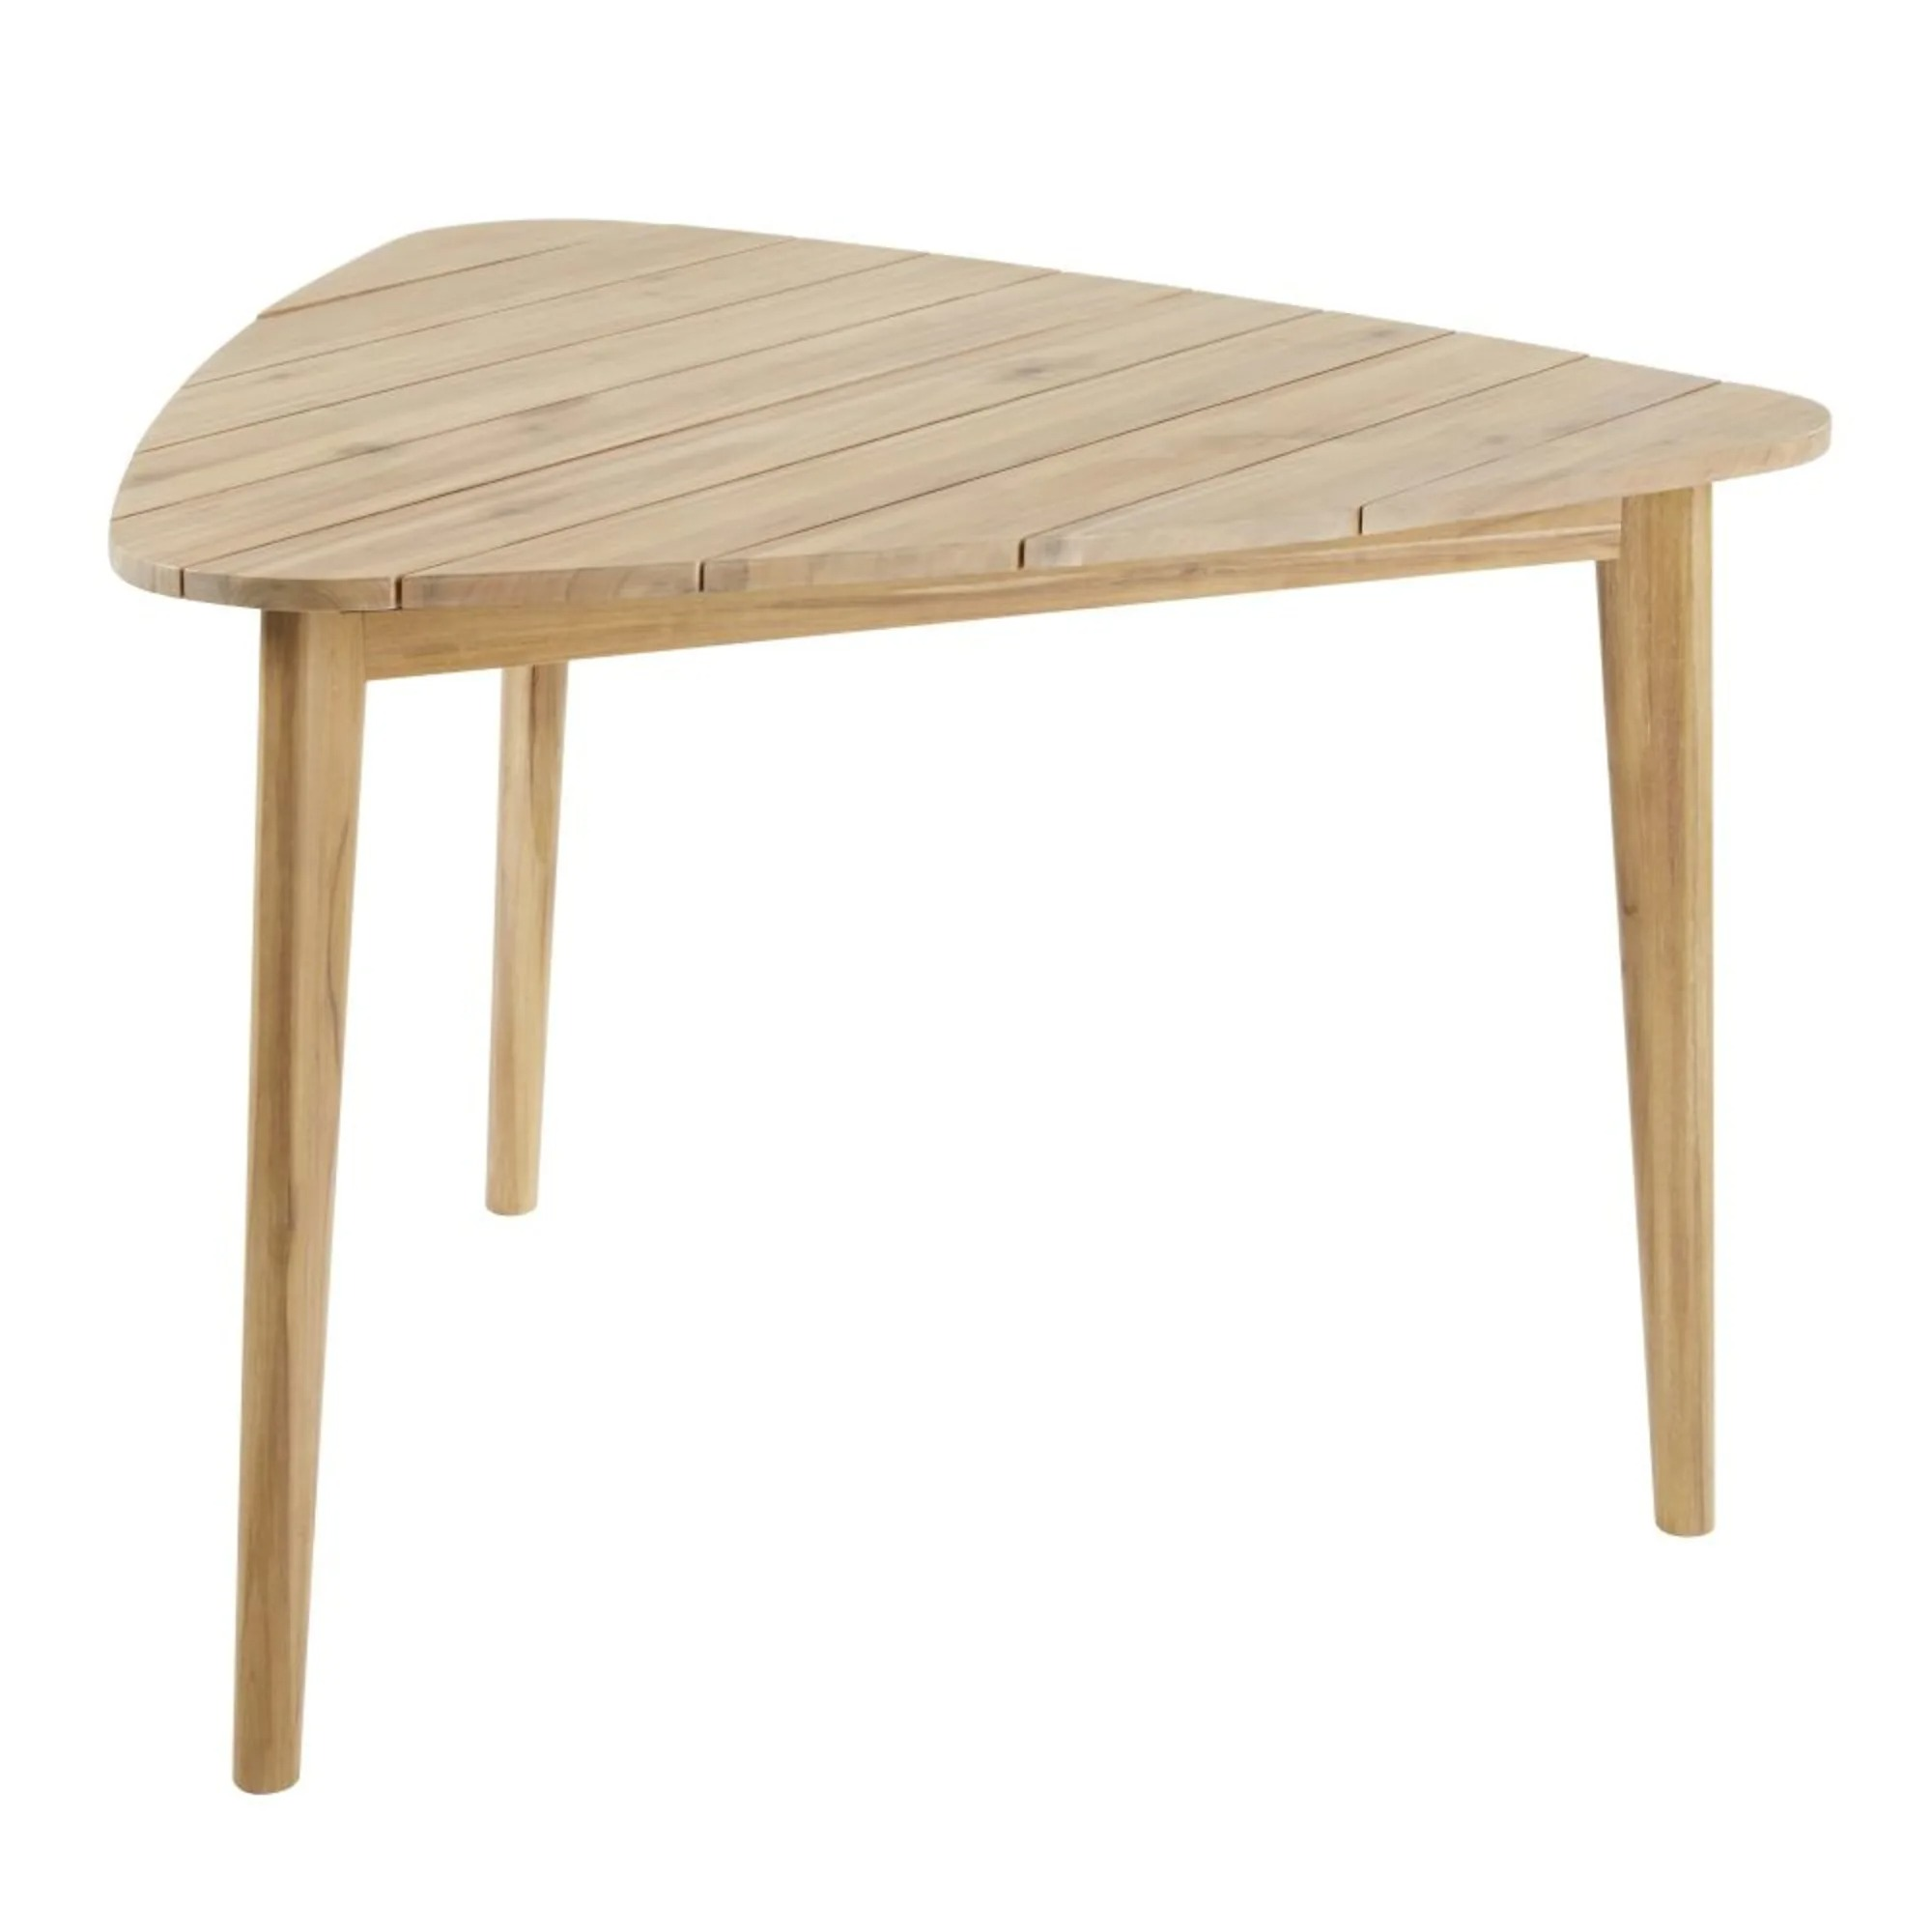 Mesa de jardín triangular de acacia maciza para 3 personas L 110